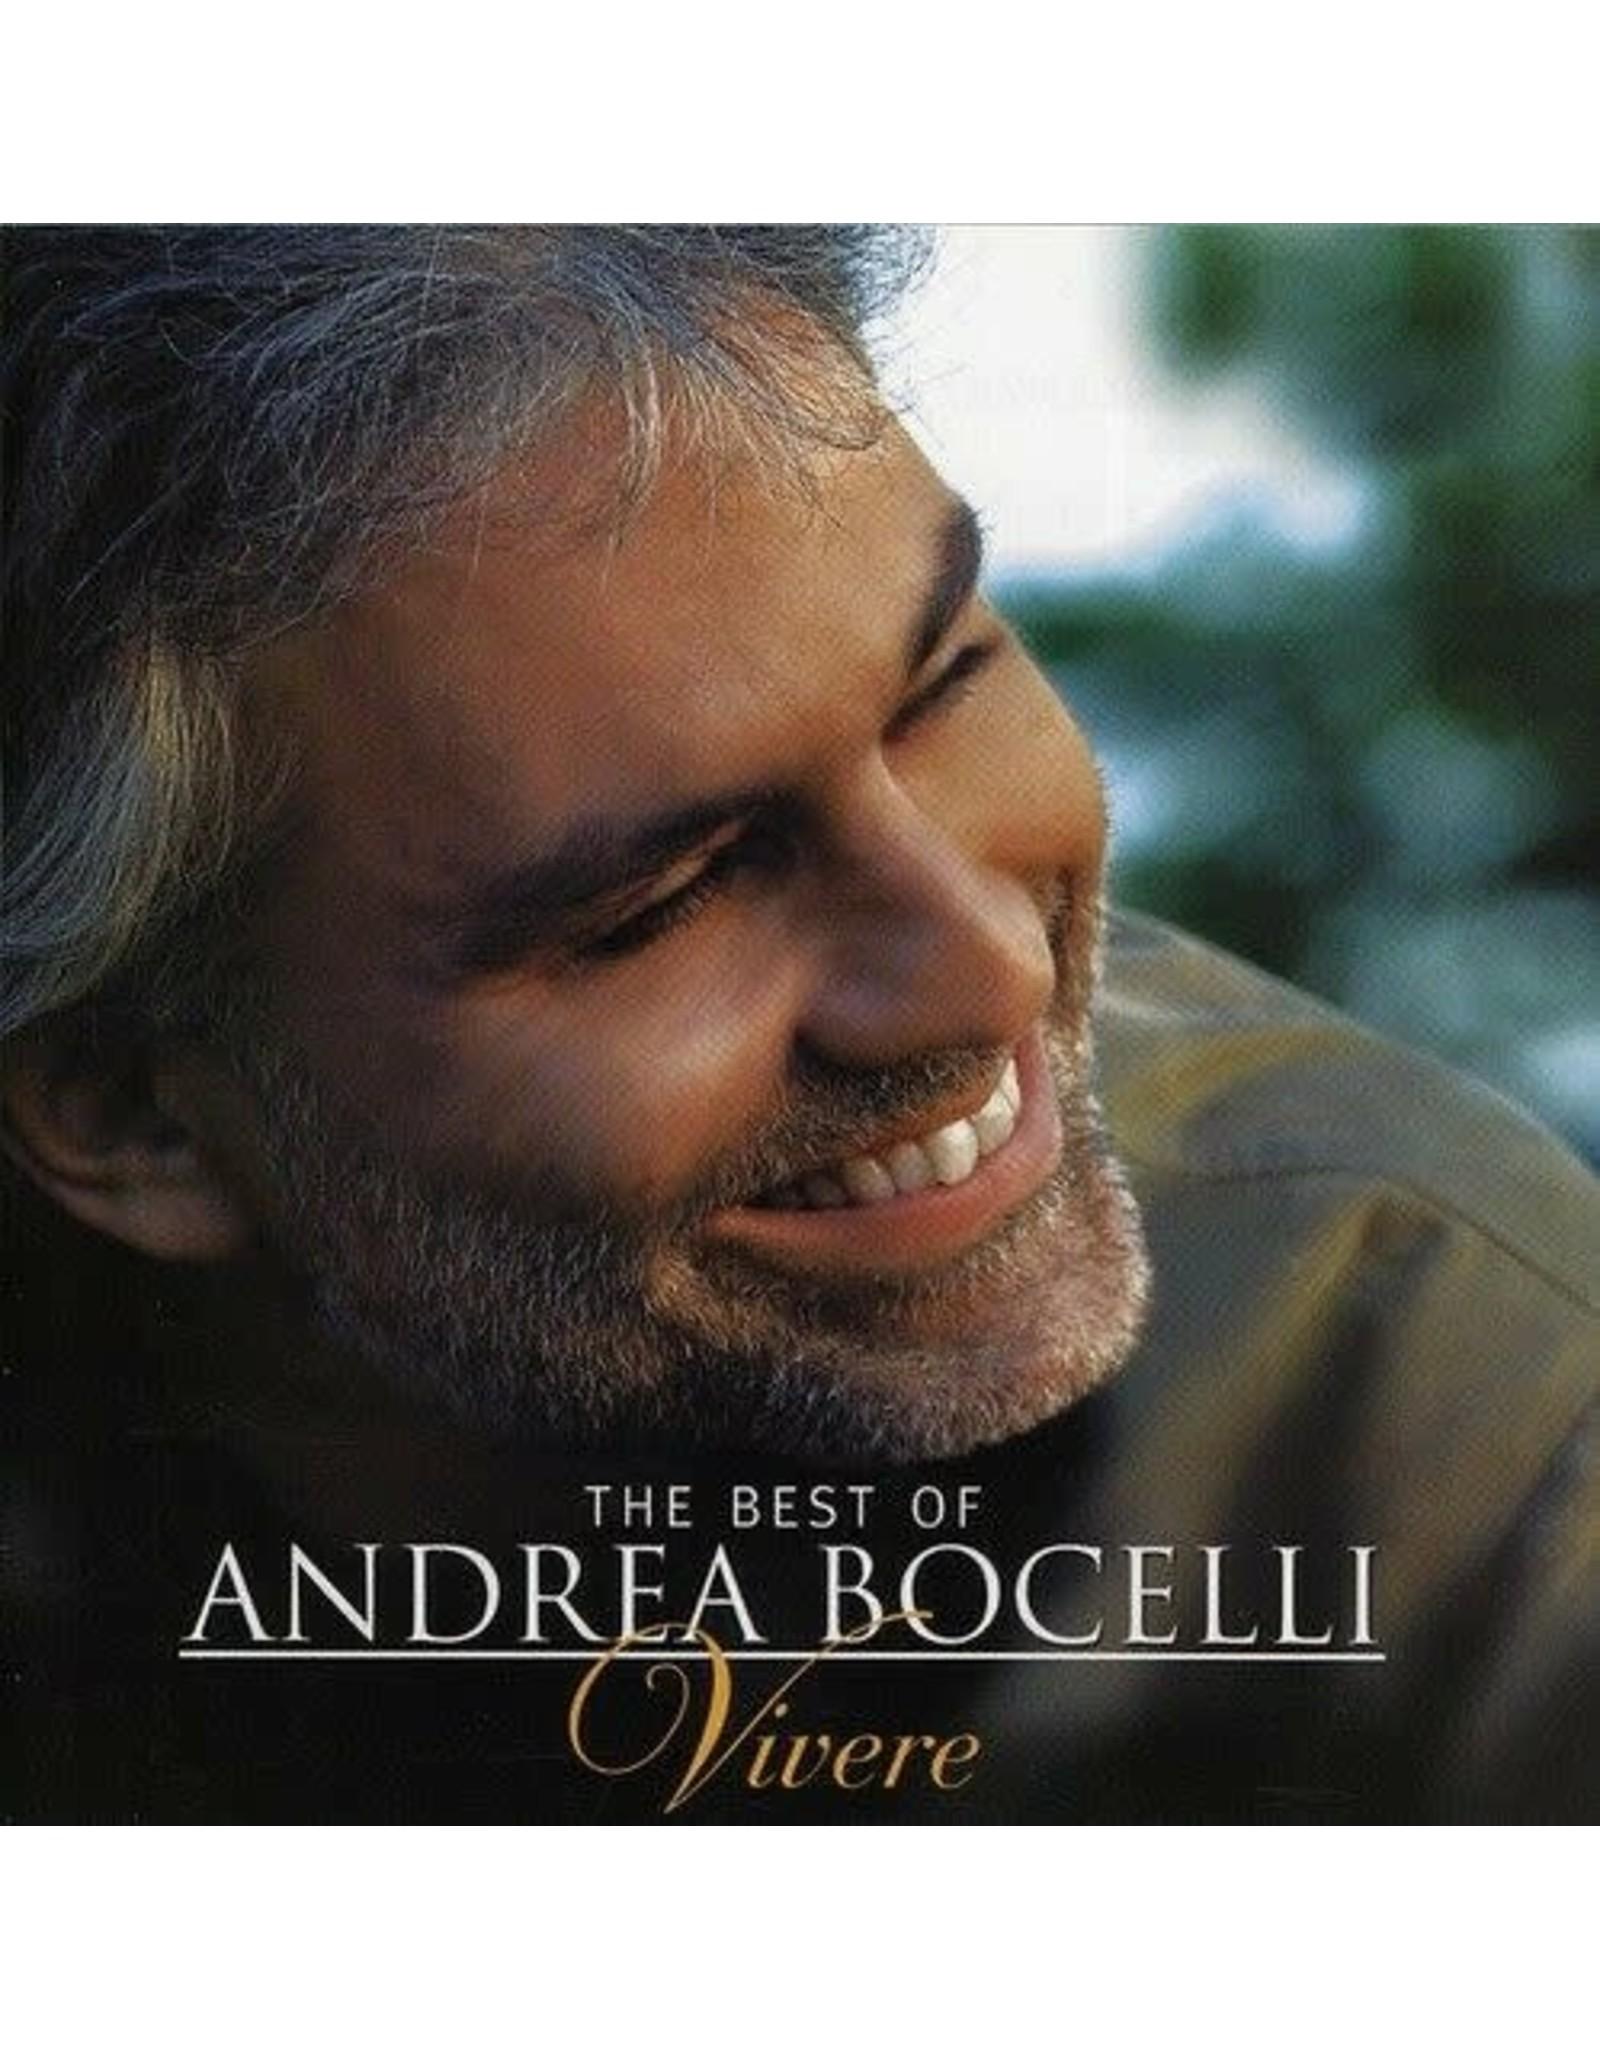 Best of Andrea Bocelli: Vivere (CD)